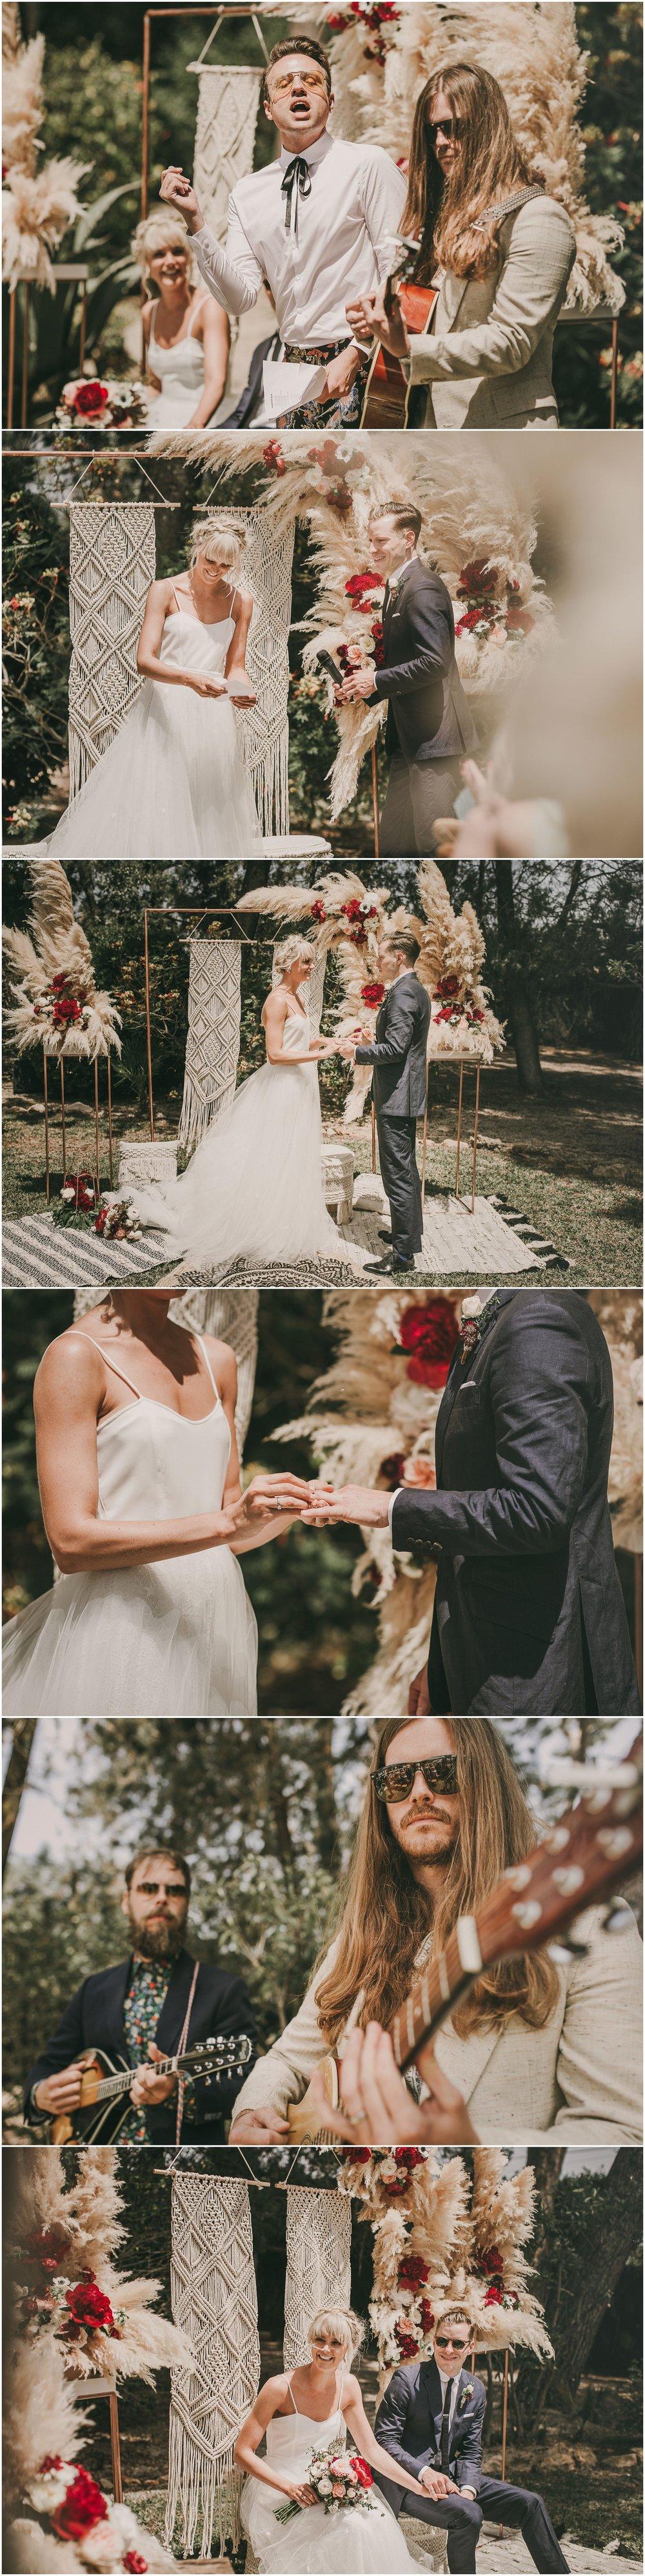 Emily & Joseph London wedding  by Pablo Laguia 089.JPG